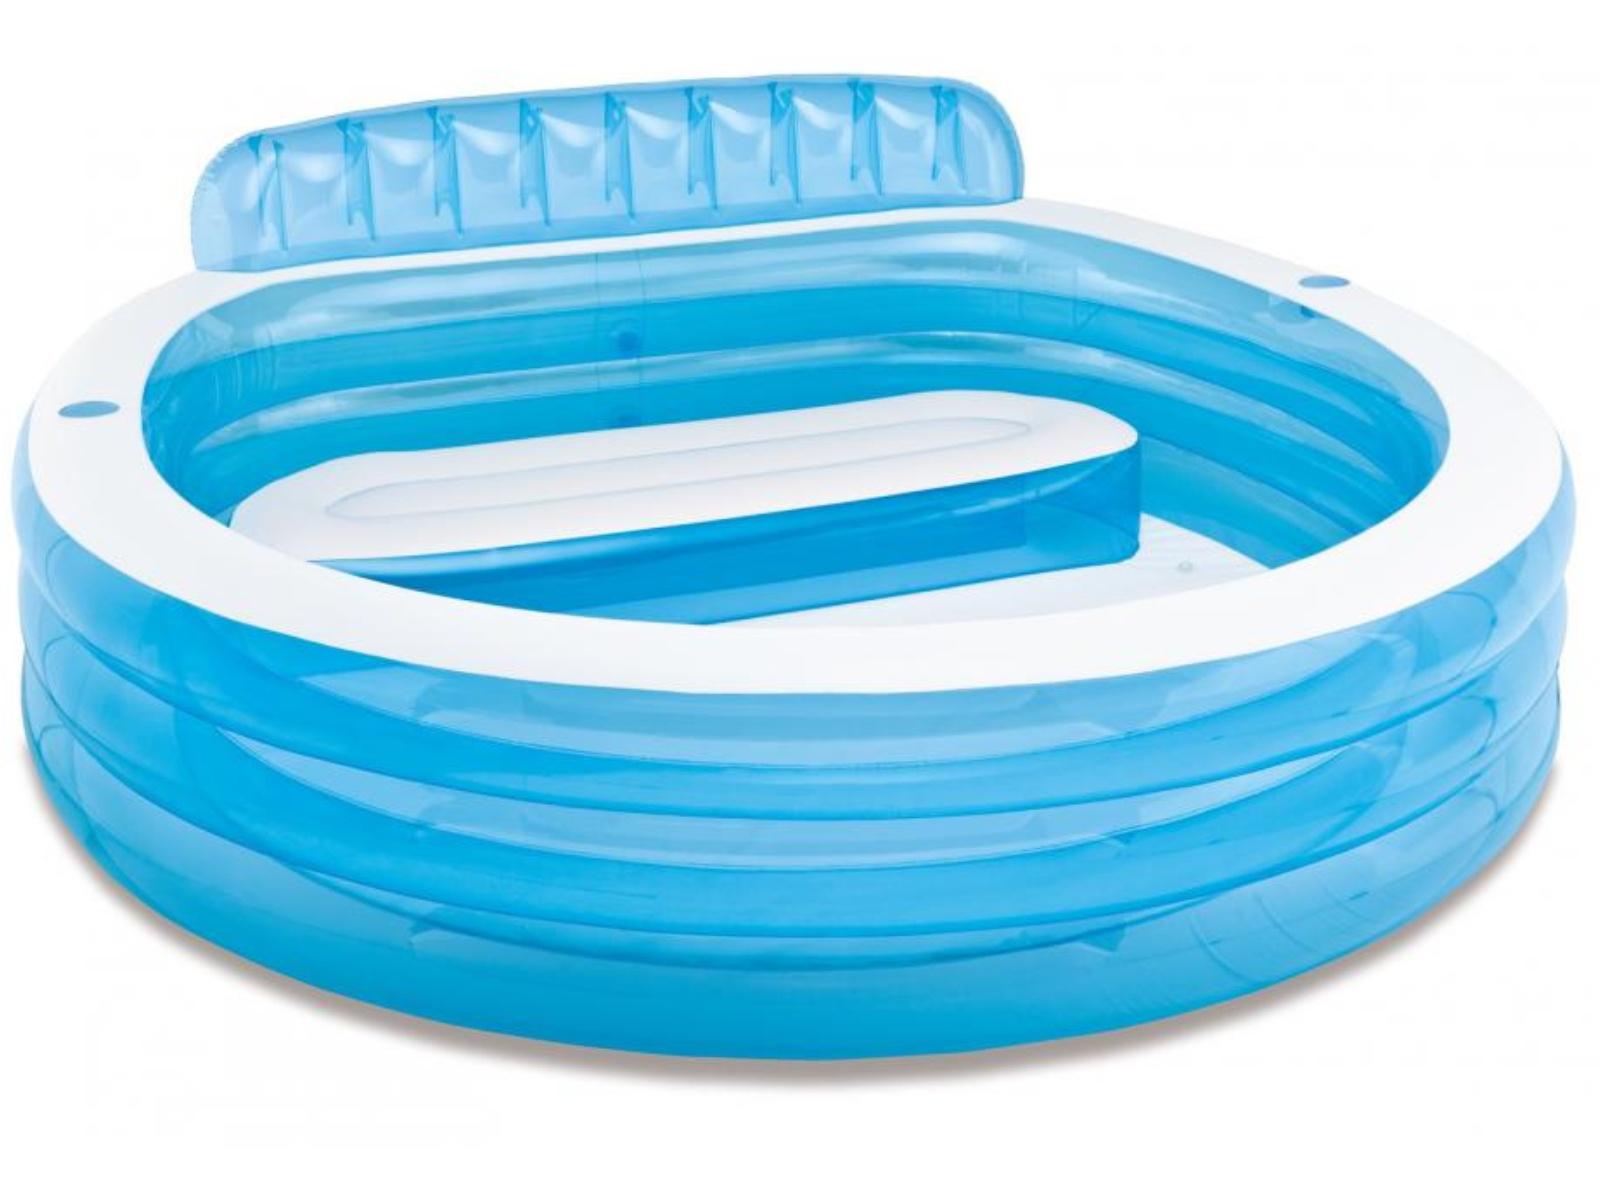 616f80e37 Nafukovací bazén INTEX Family Center 224 x 216 x 76 cm